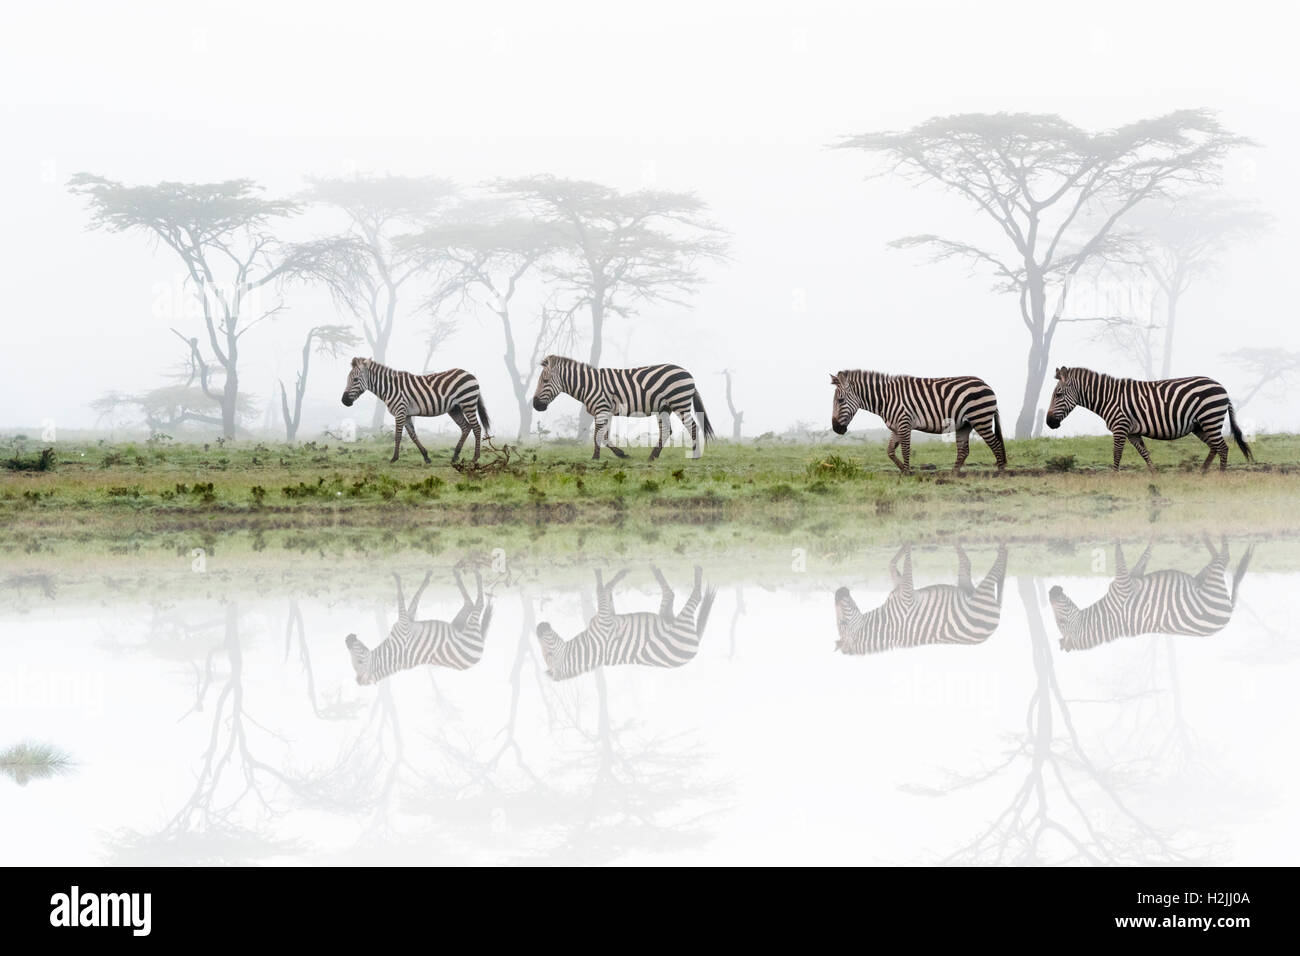 Common or plains zebra (Equus quagga) walking on savanna with fog and reflection, Maasai Mara National Reserve, - Stock Photo